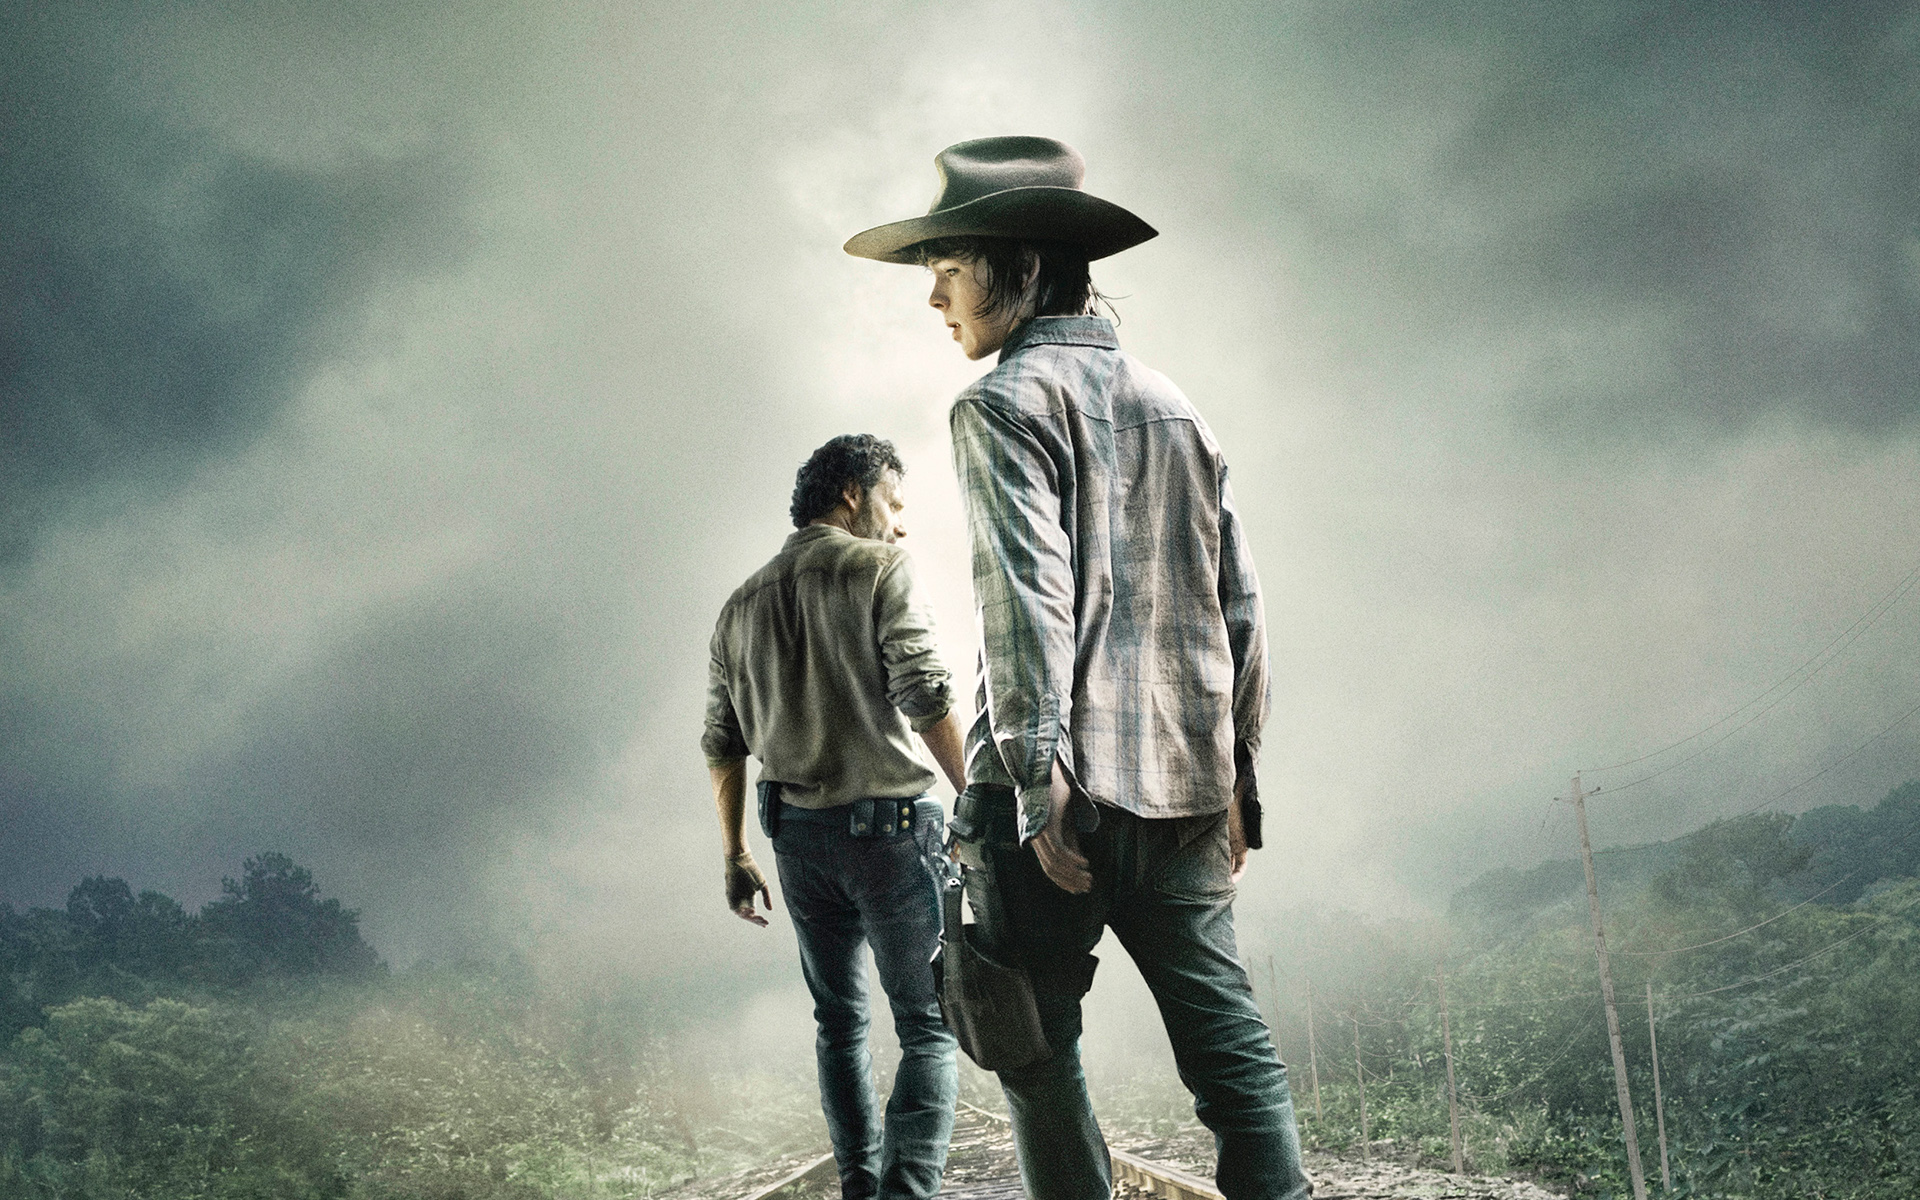 The Walking Dead 2014 Wallpapers HD Wallpapers 1920x1200